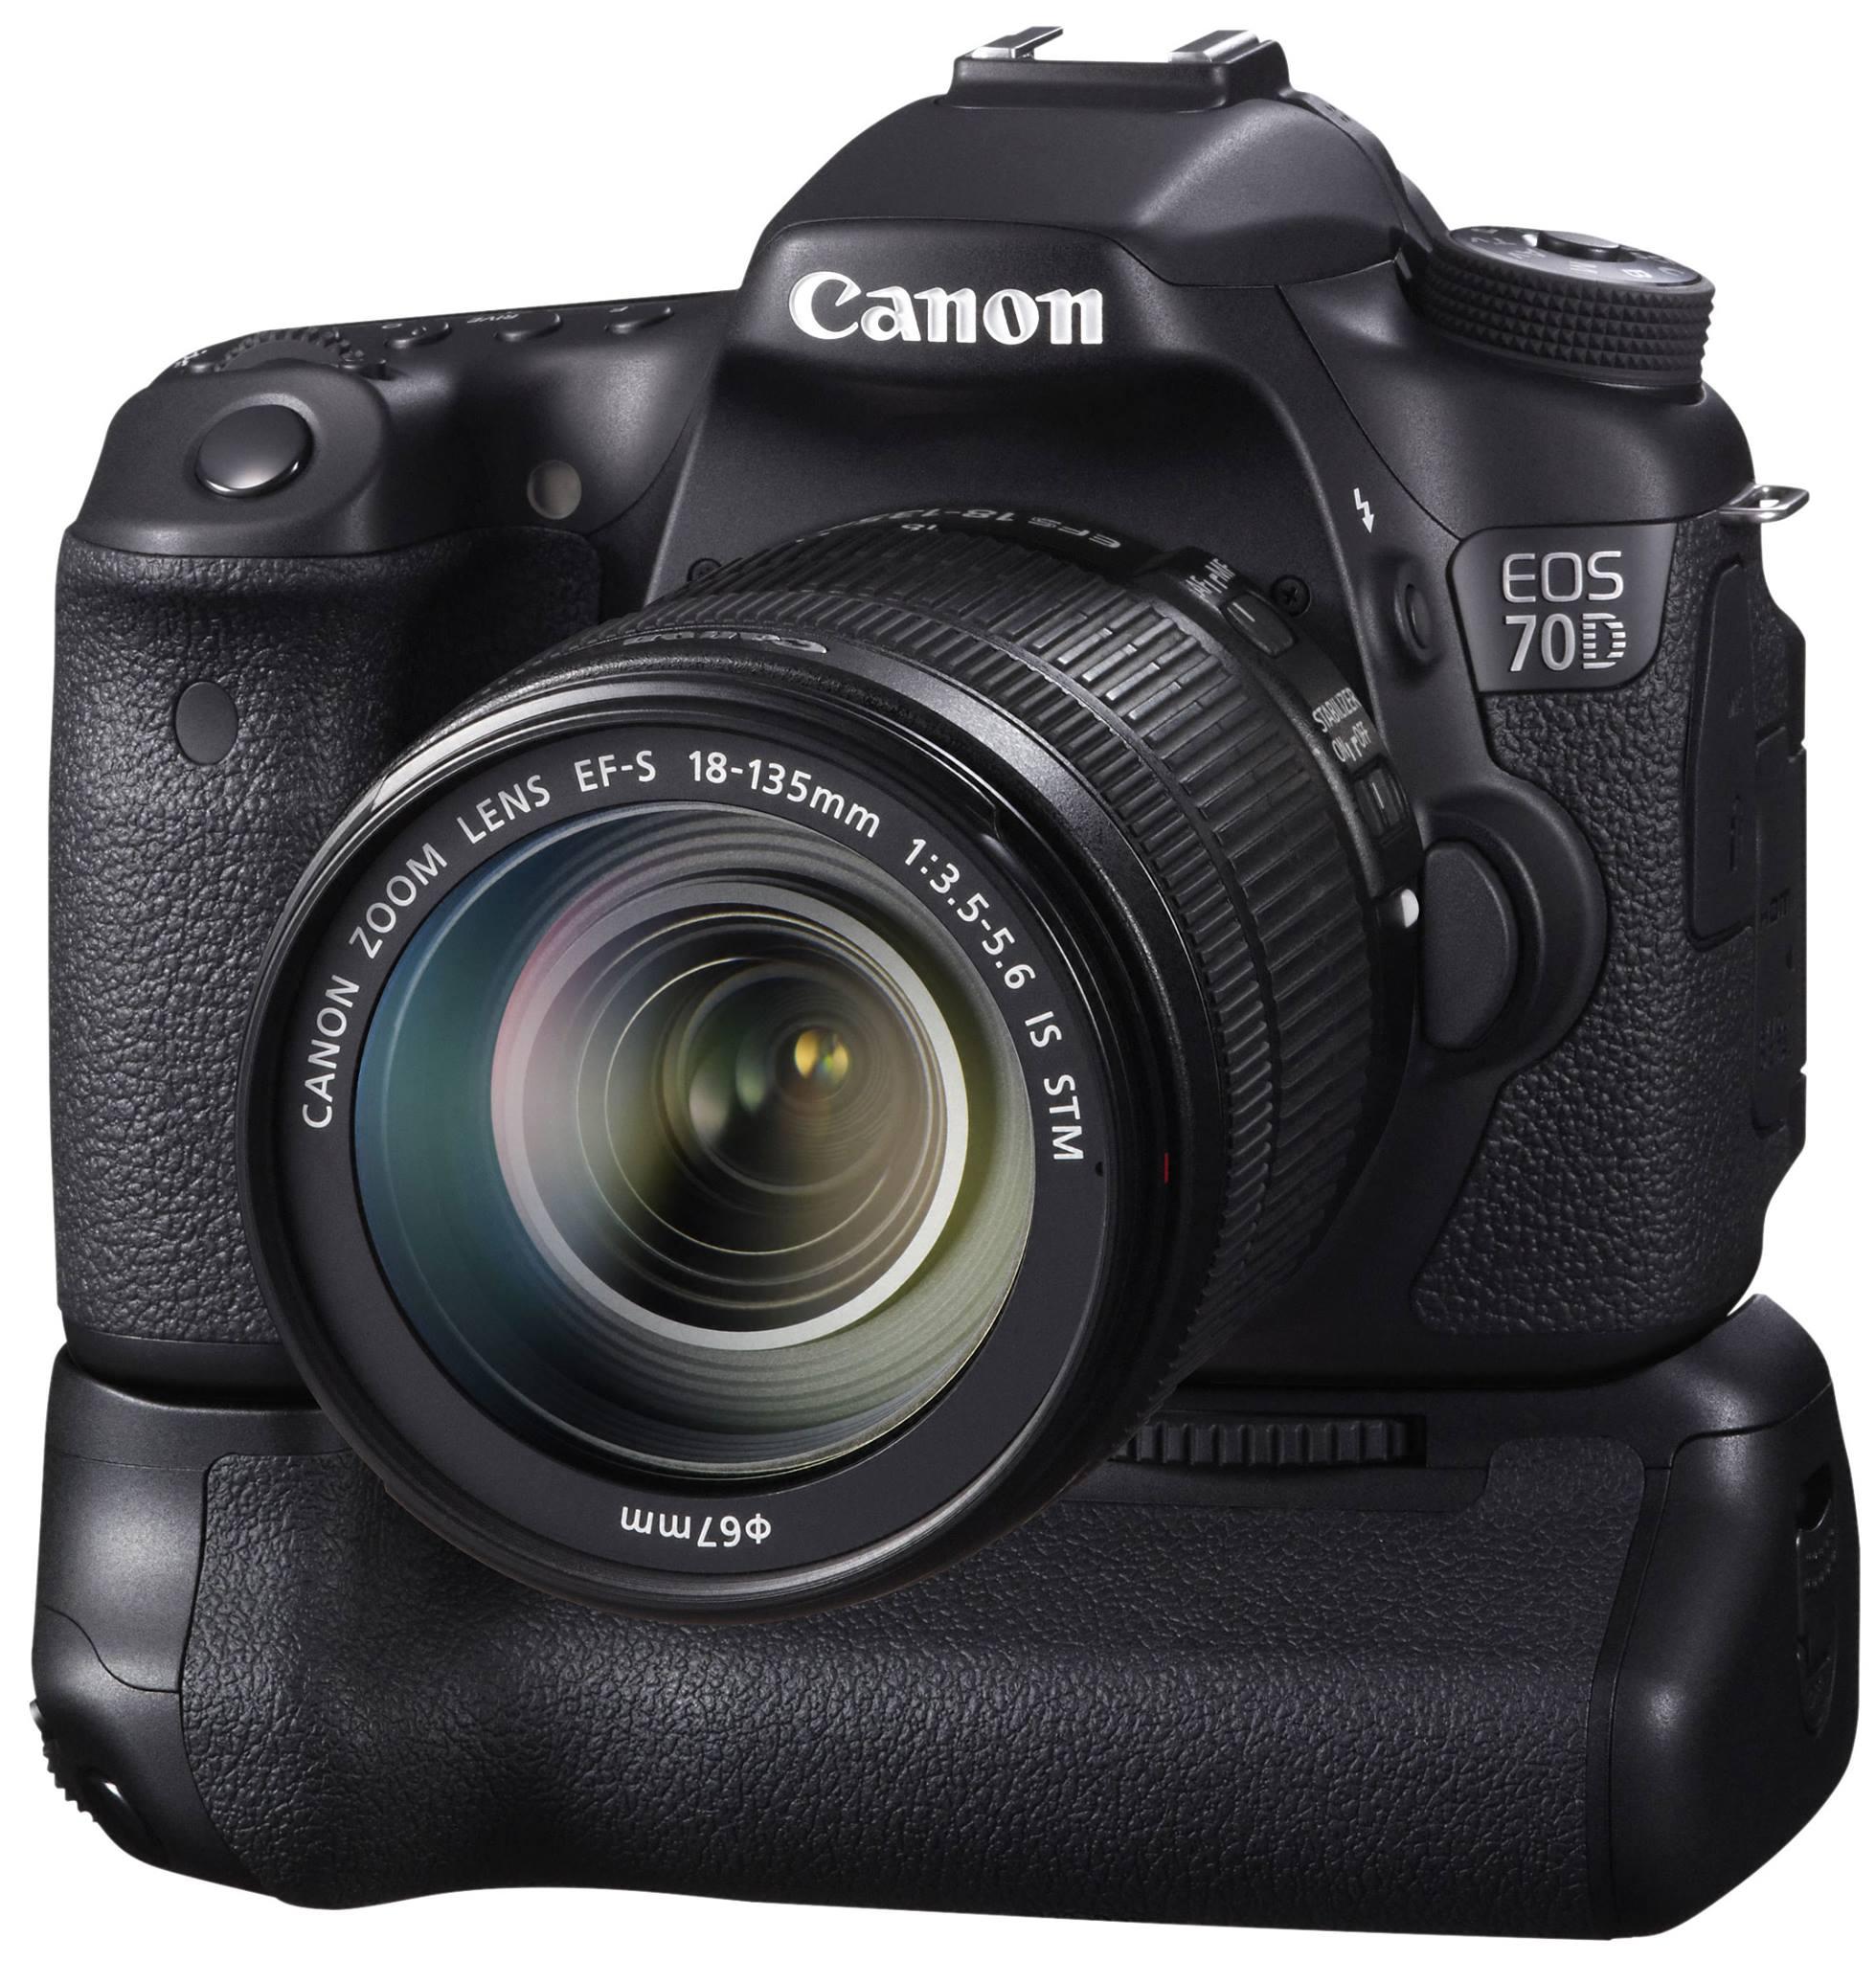 Engaging Stock At Amazon Camera Sony A6000 Amazon Warehouse Sony A6000 Amazon Kit Has Canon Eos After Photo Video Canon Body Kits Now Has All Kits dpreview Sony A6000 Amazon